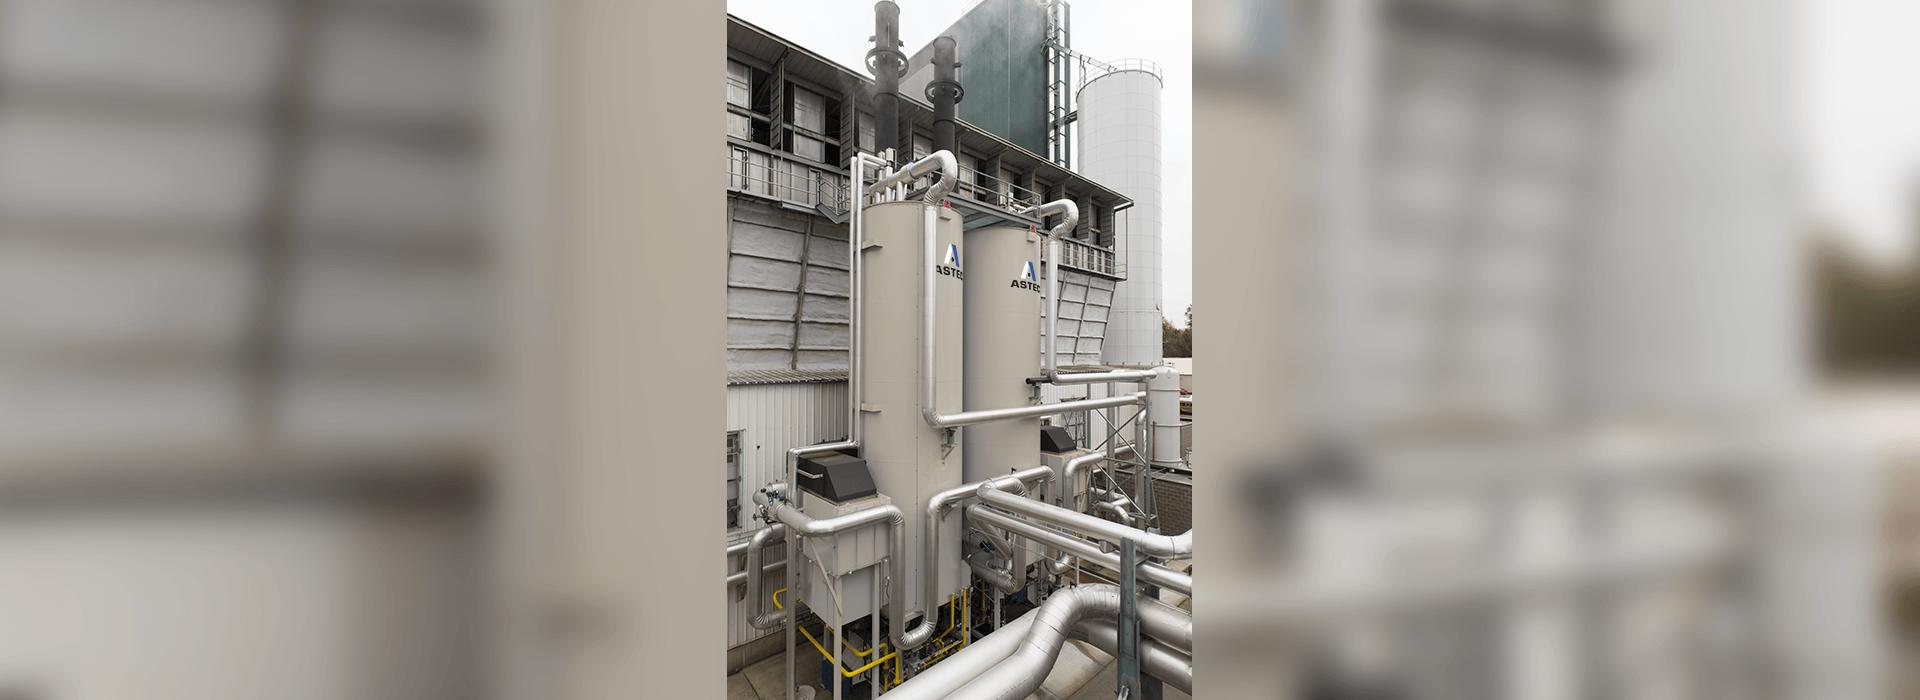 Heatec HCI Industrial Heaters